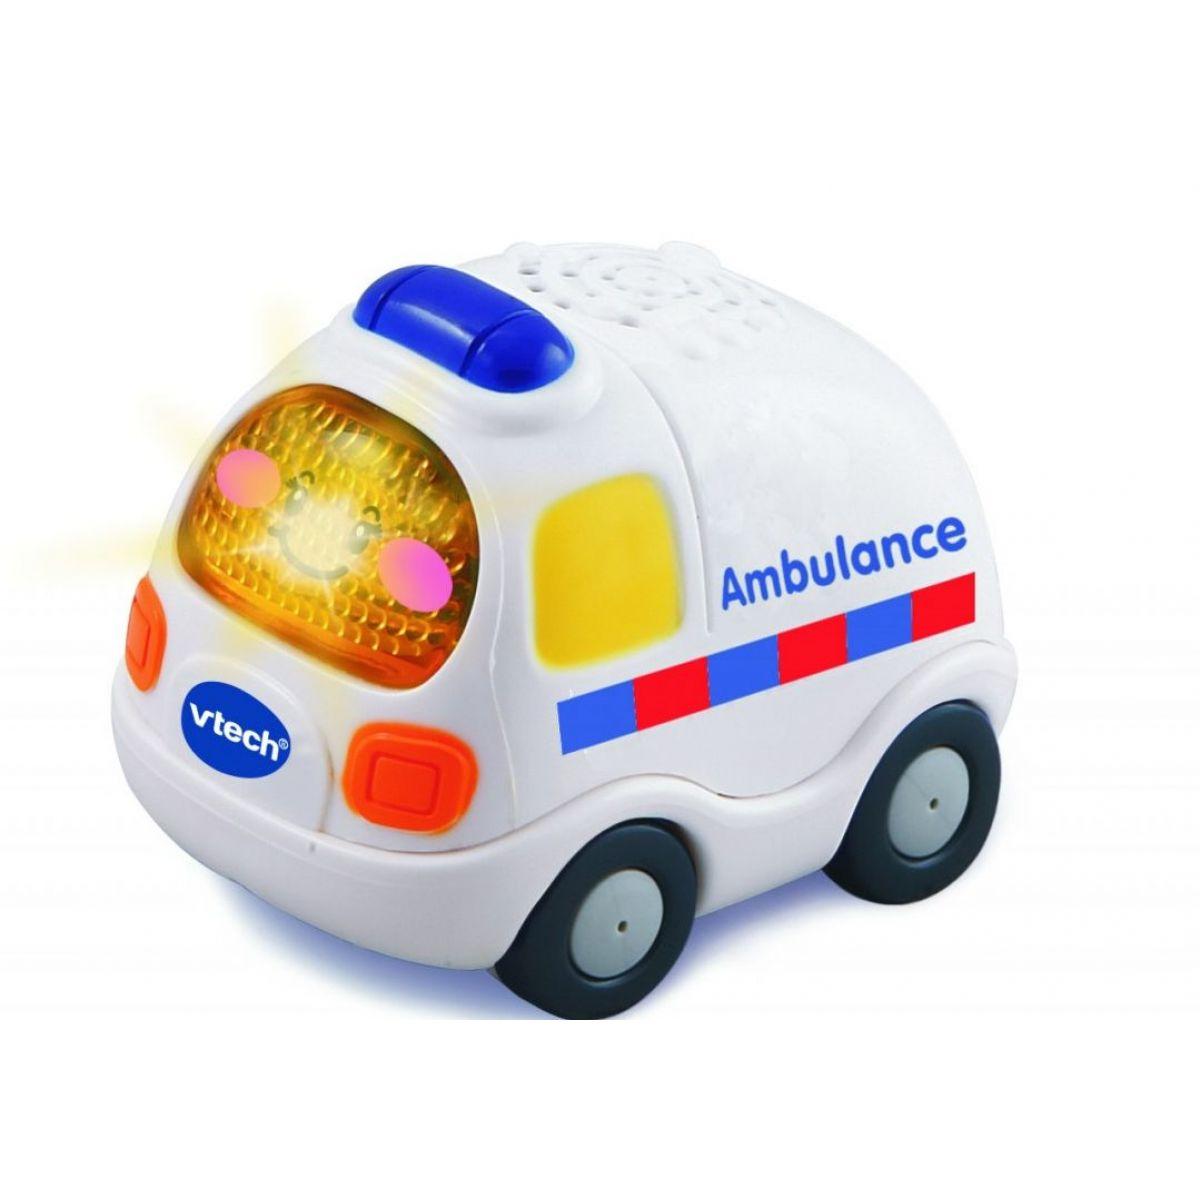 Vtech Tut Tut Ambulancia CZ